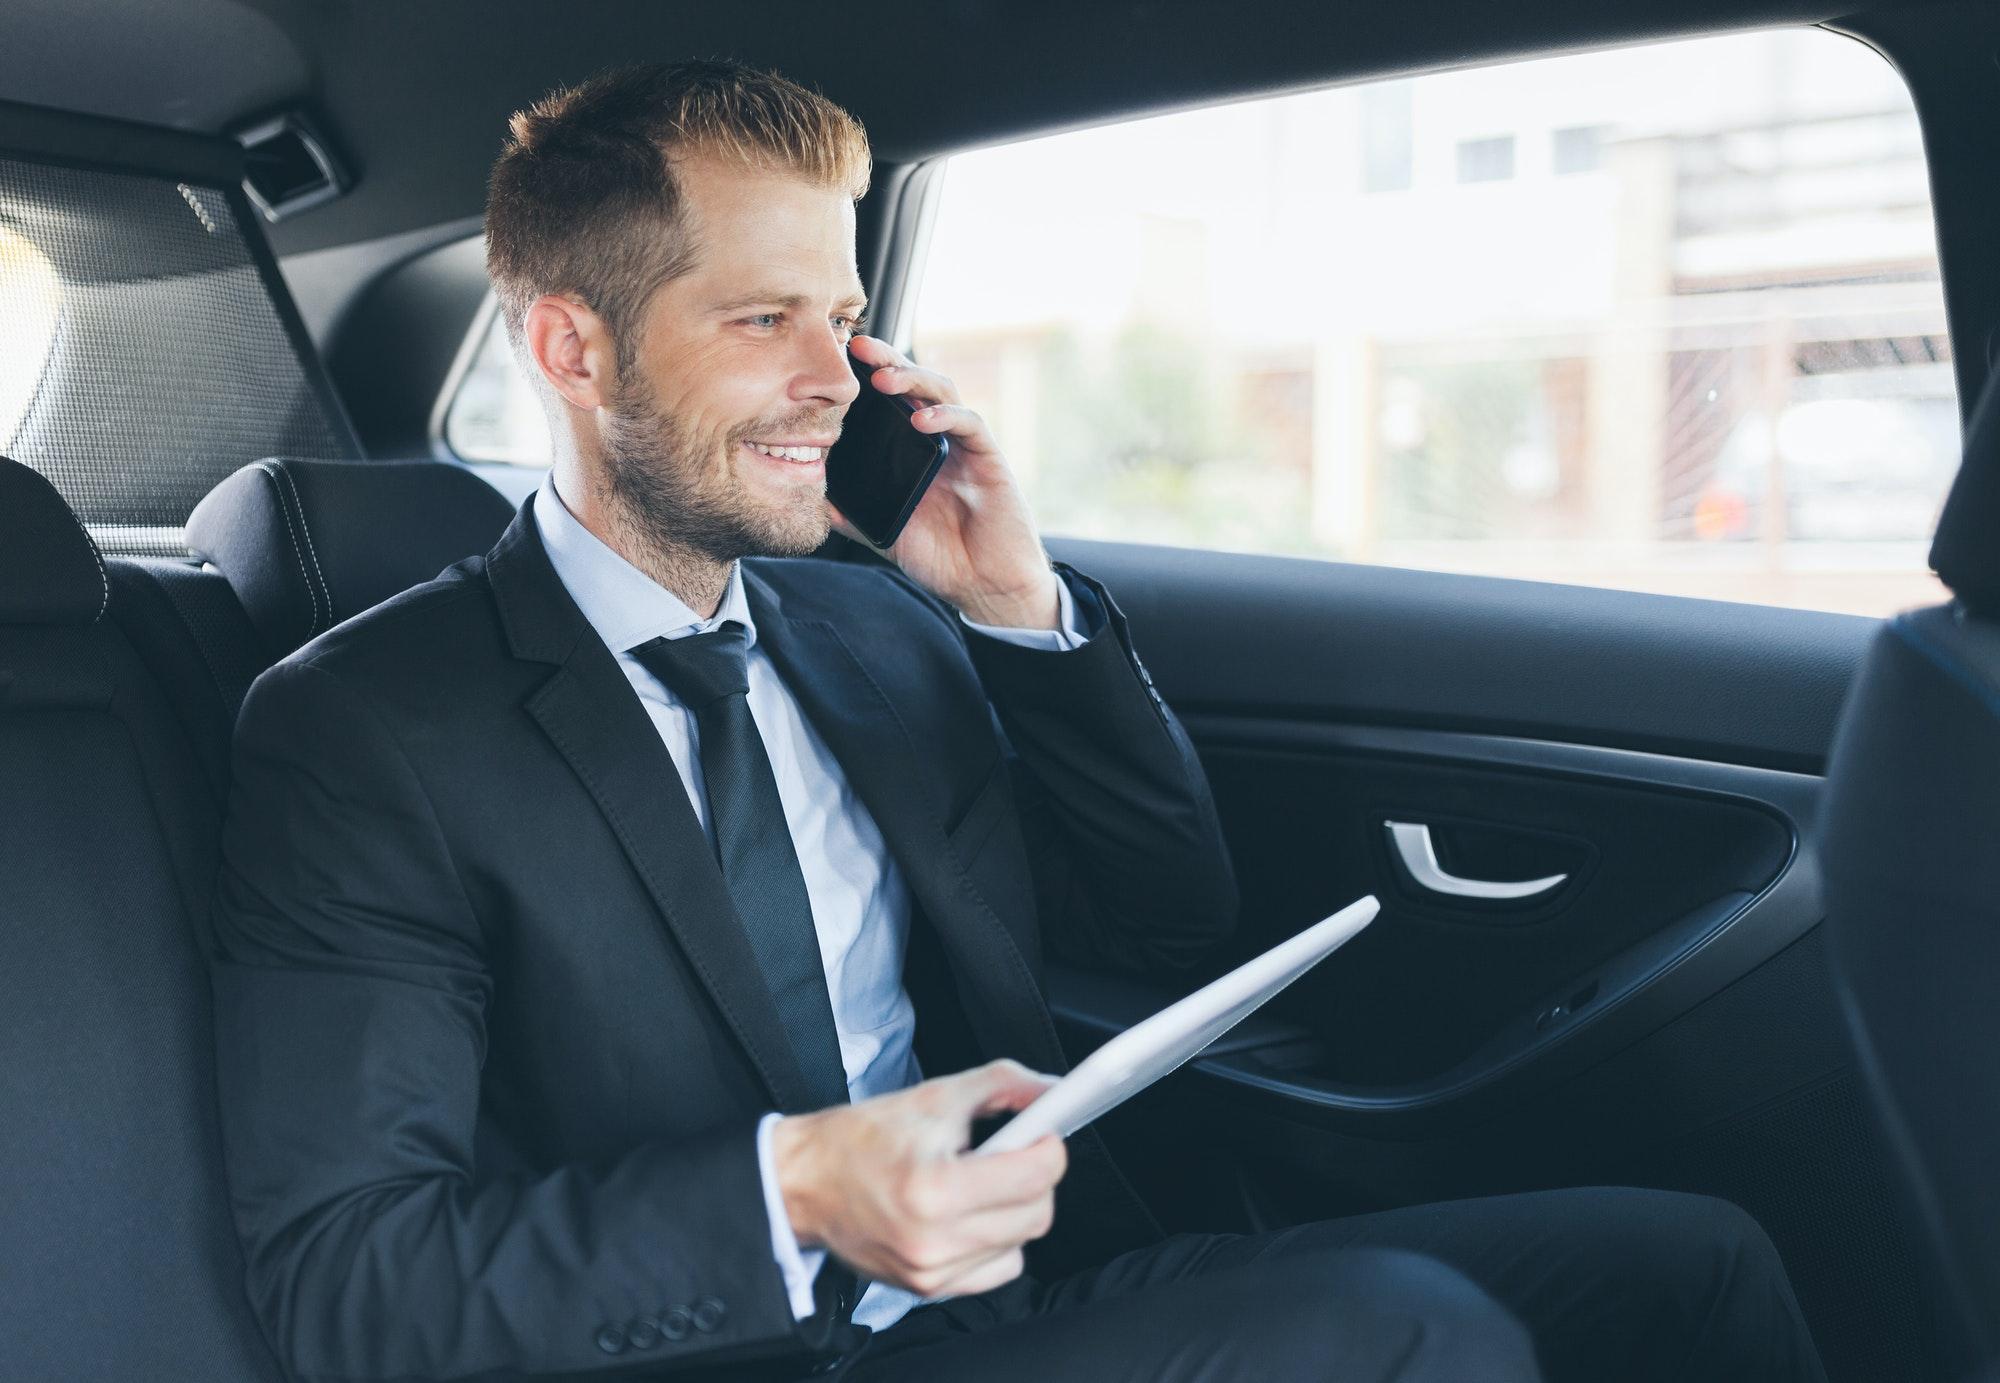 Chauffeur Service Software